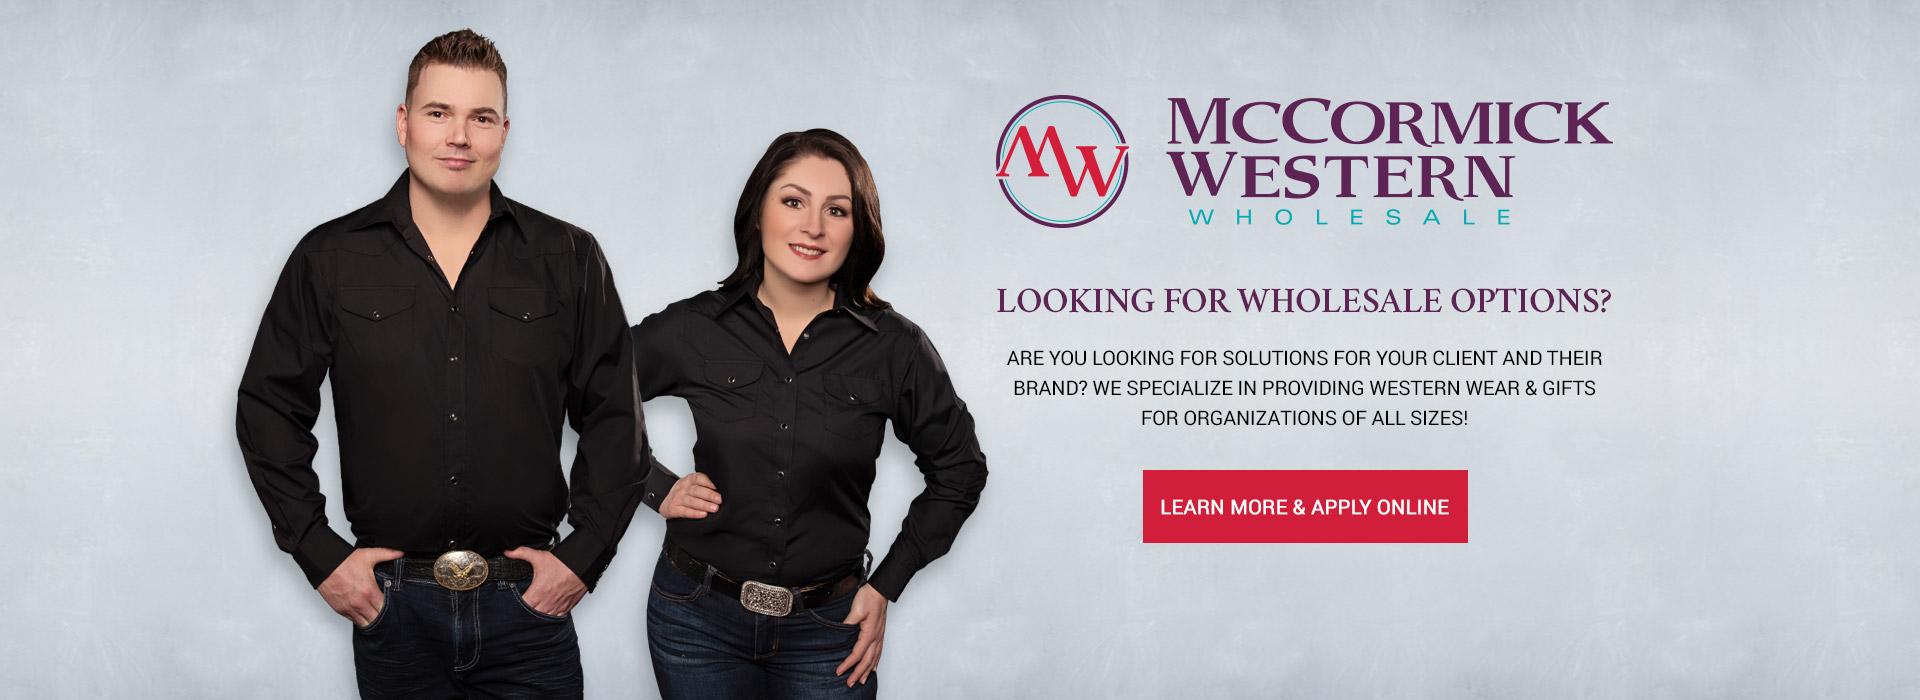 McCormick Western Wholesale